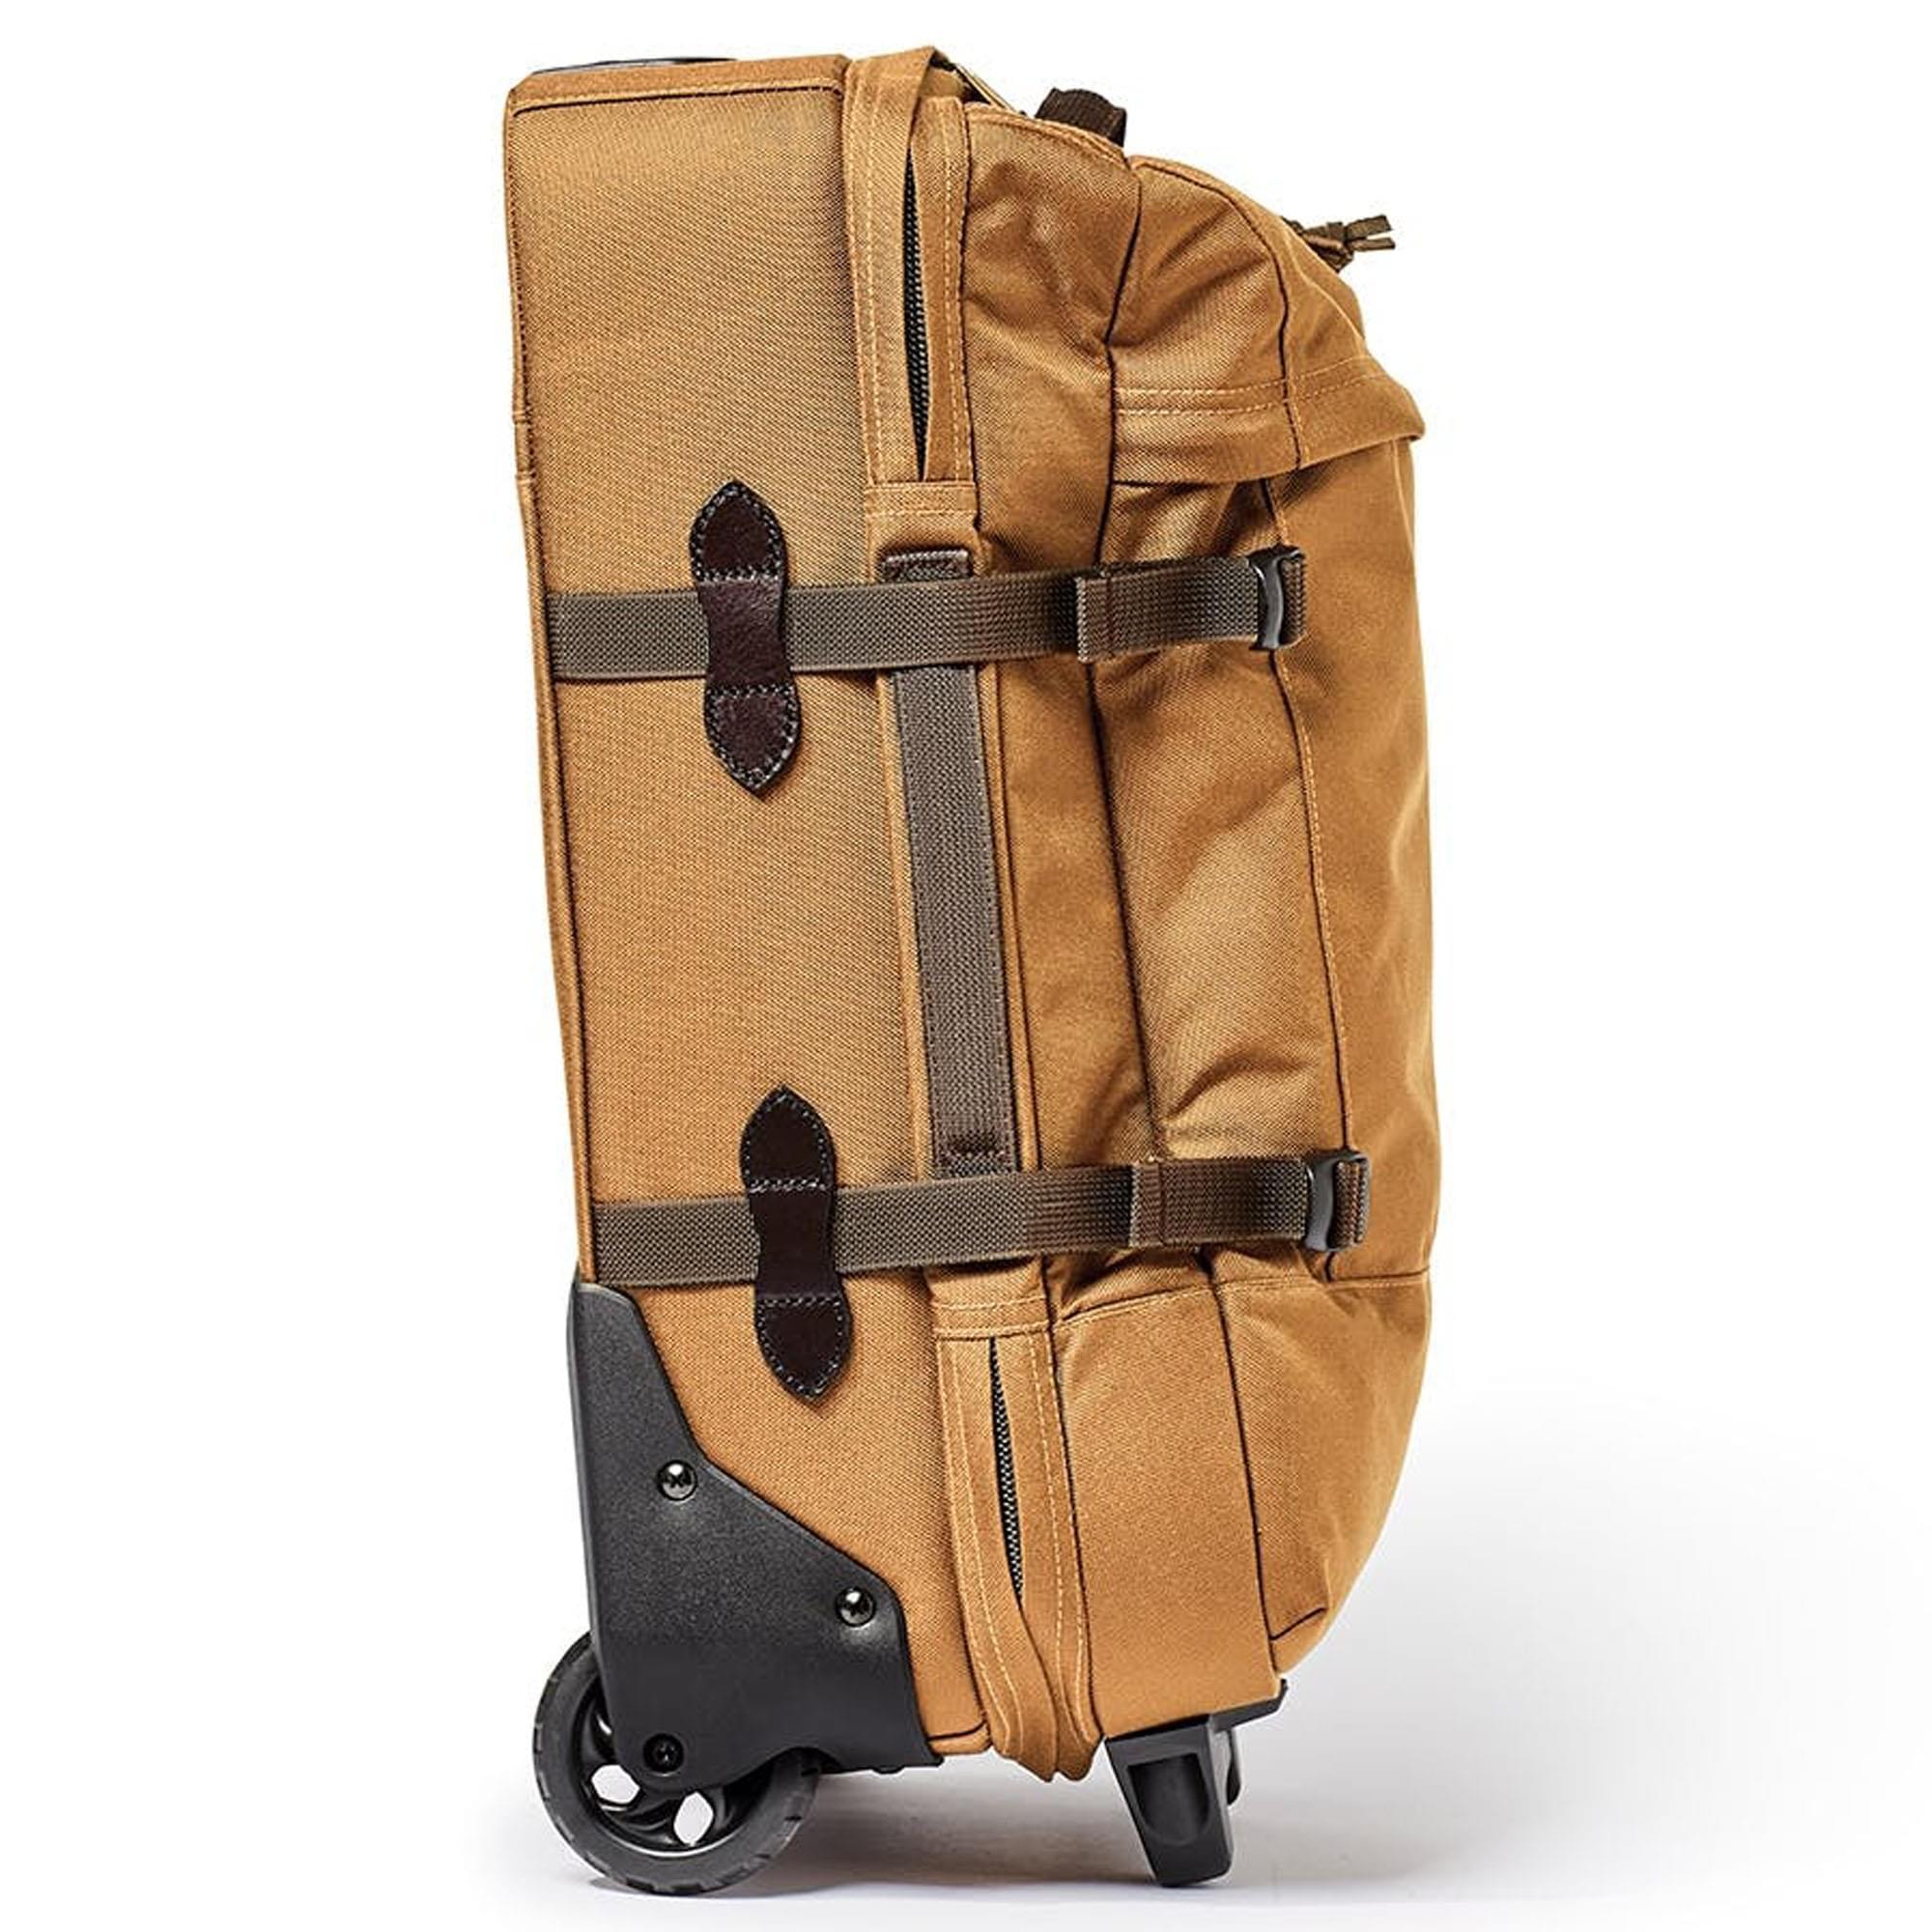 Filson - Multicolor Whiskey Ballistic Nylon Dryden Carry On Suitcase for Men  - Lyst. View fullscreen 6a8baab640c4f